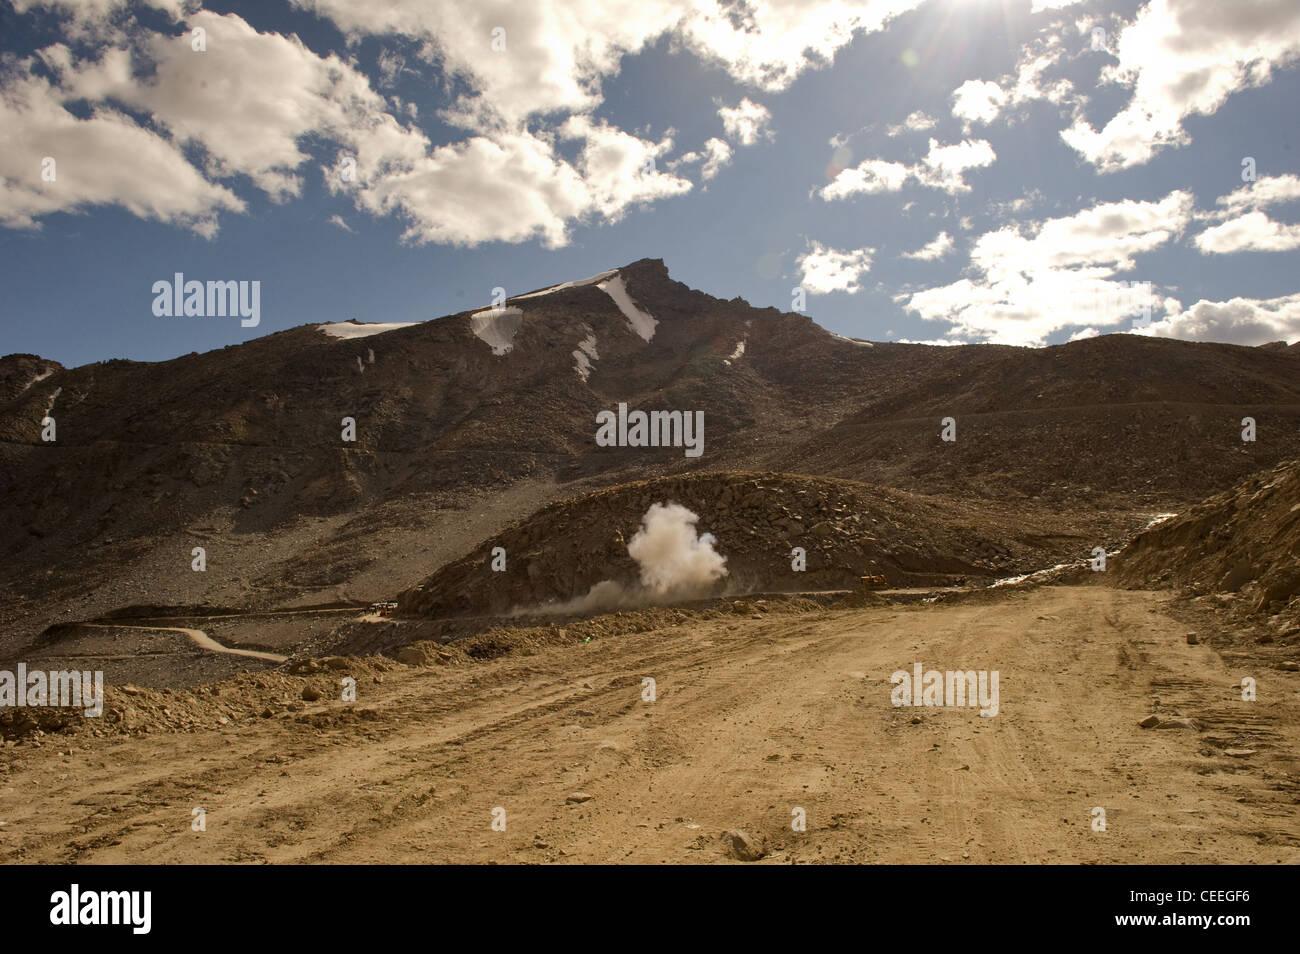 Landslide disaster management near Khardungla Pass Himalayas using explosives - Stock Image